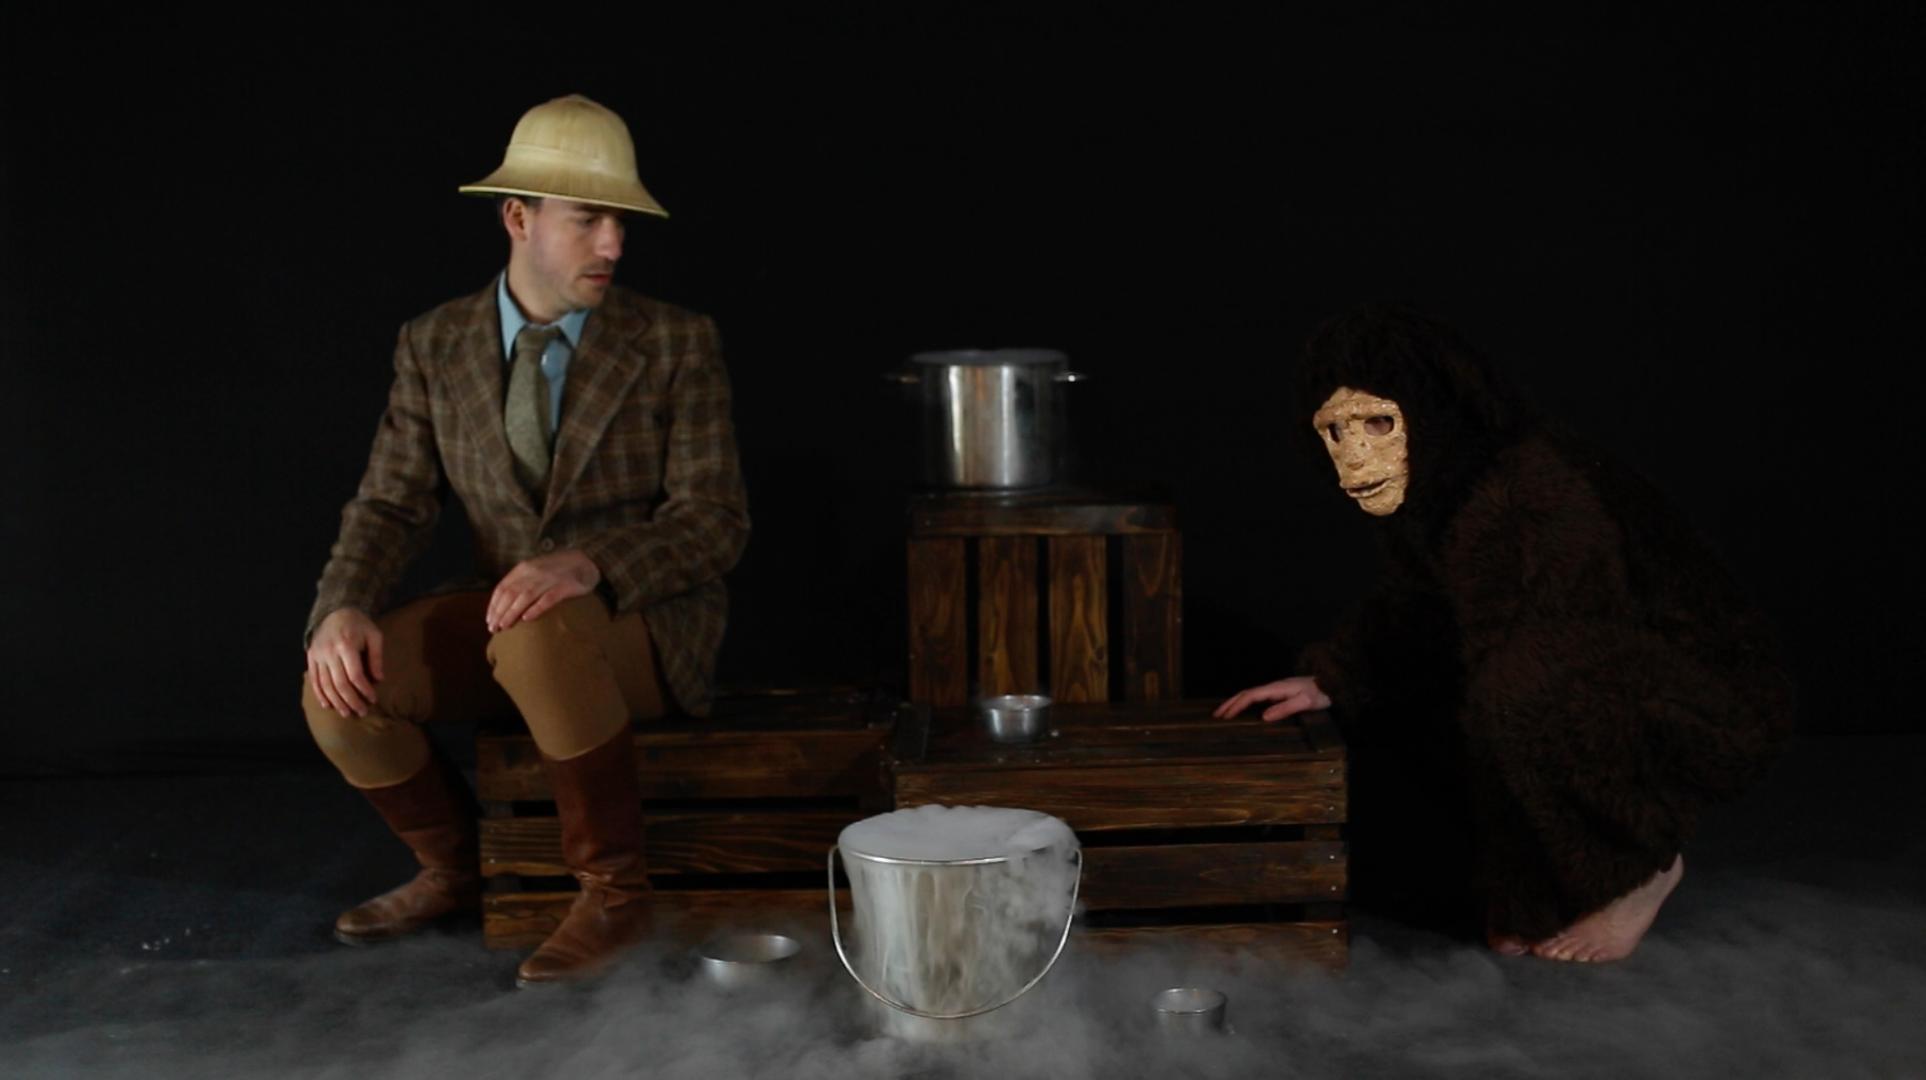 THE APE'S DREAM, video, 2014.